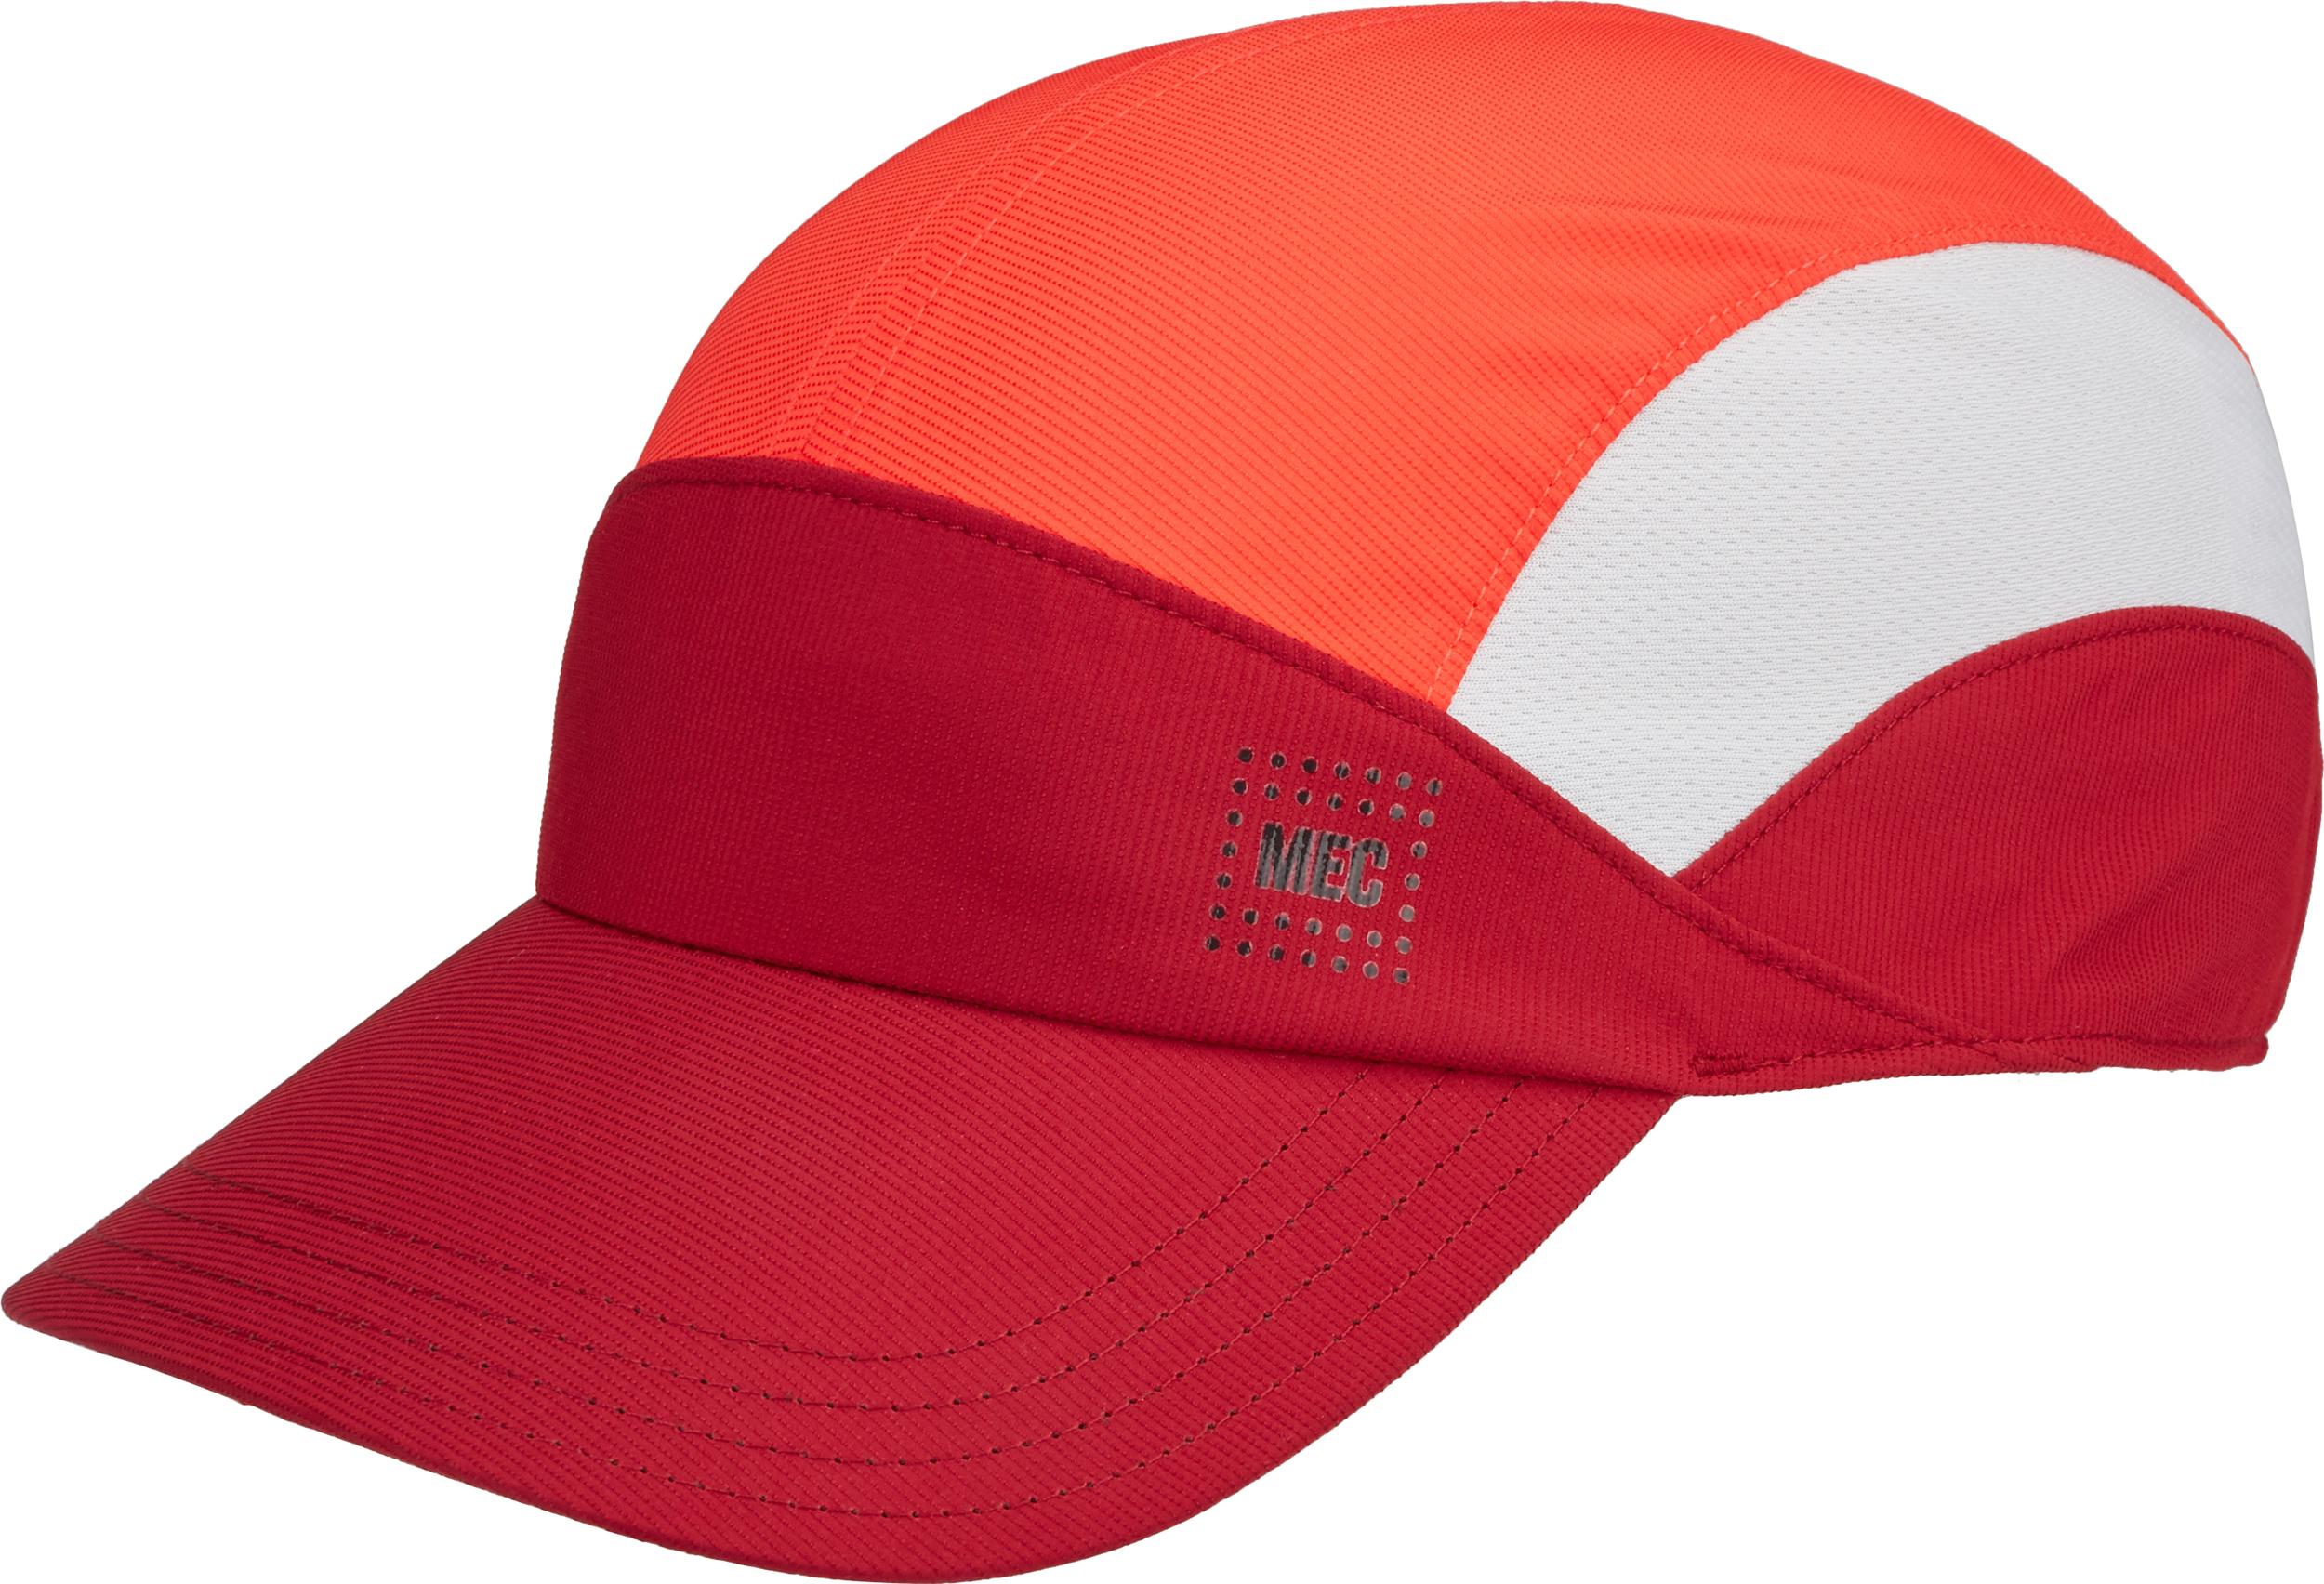 71acb1372af04 Men s Caps